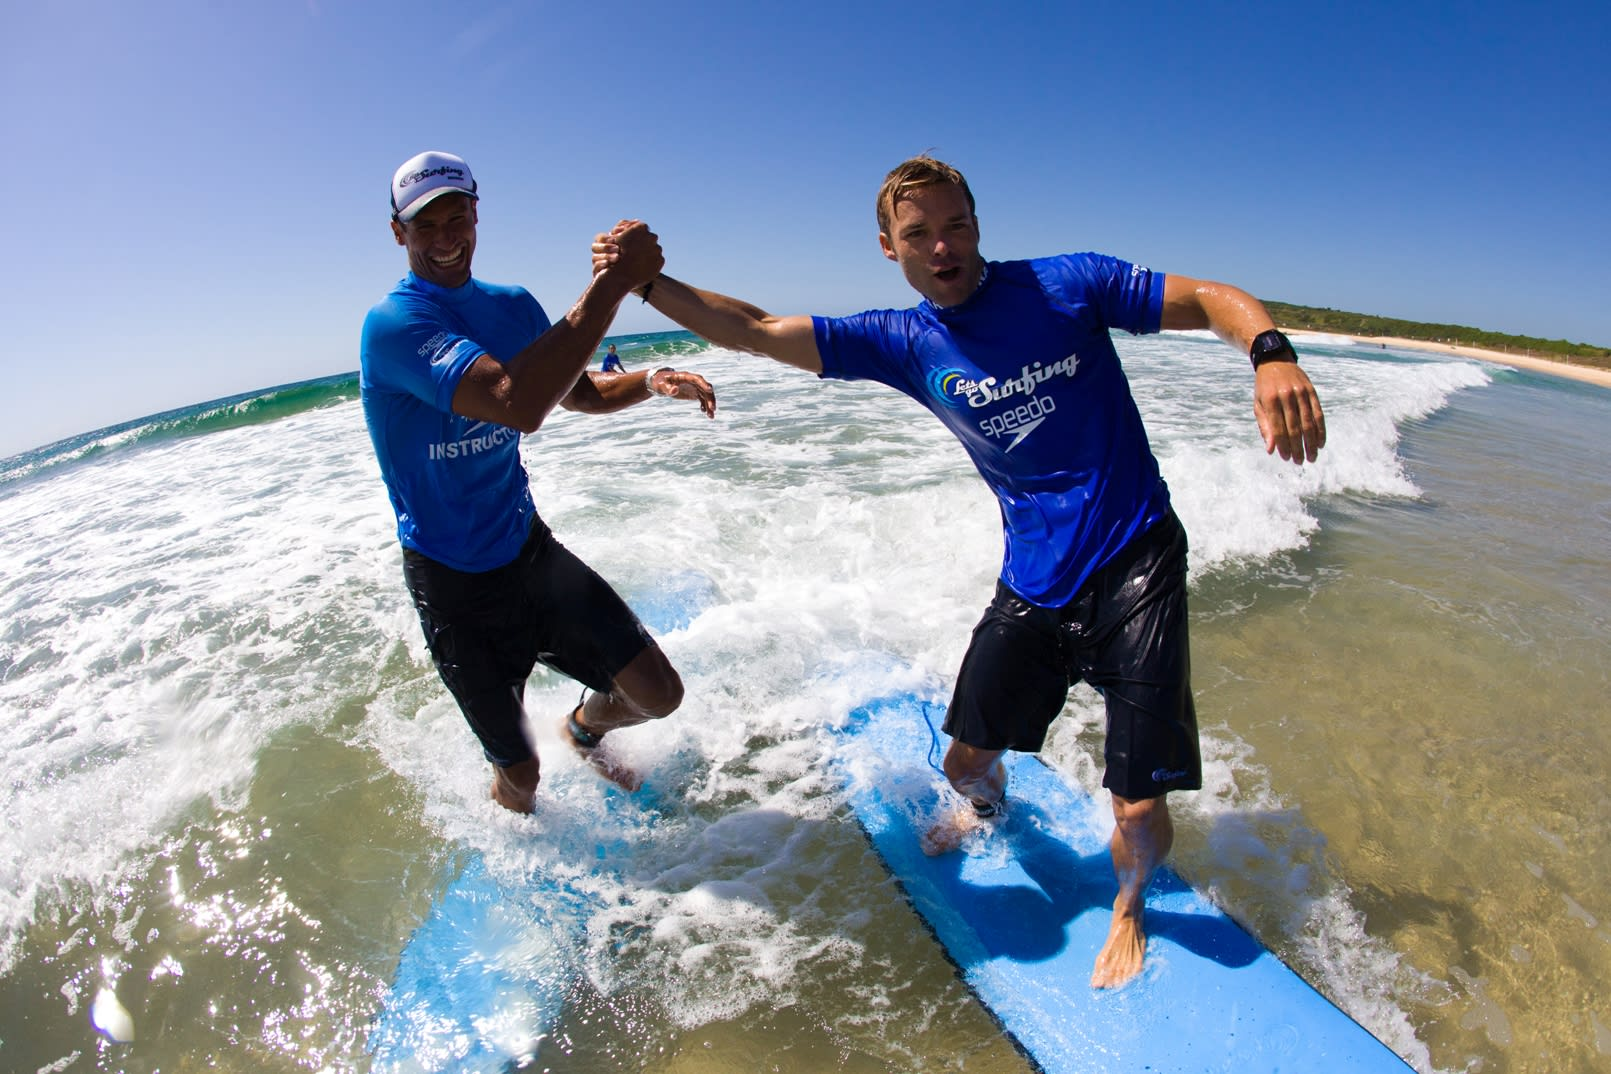 Private Surfing Lesson, 1 Hour - Bondi Beach - For 2